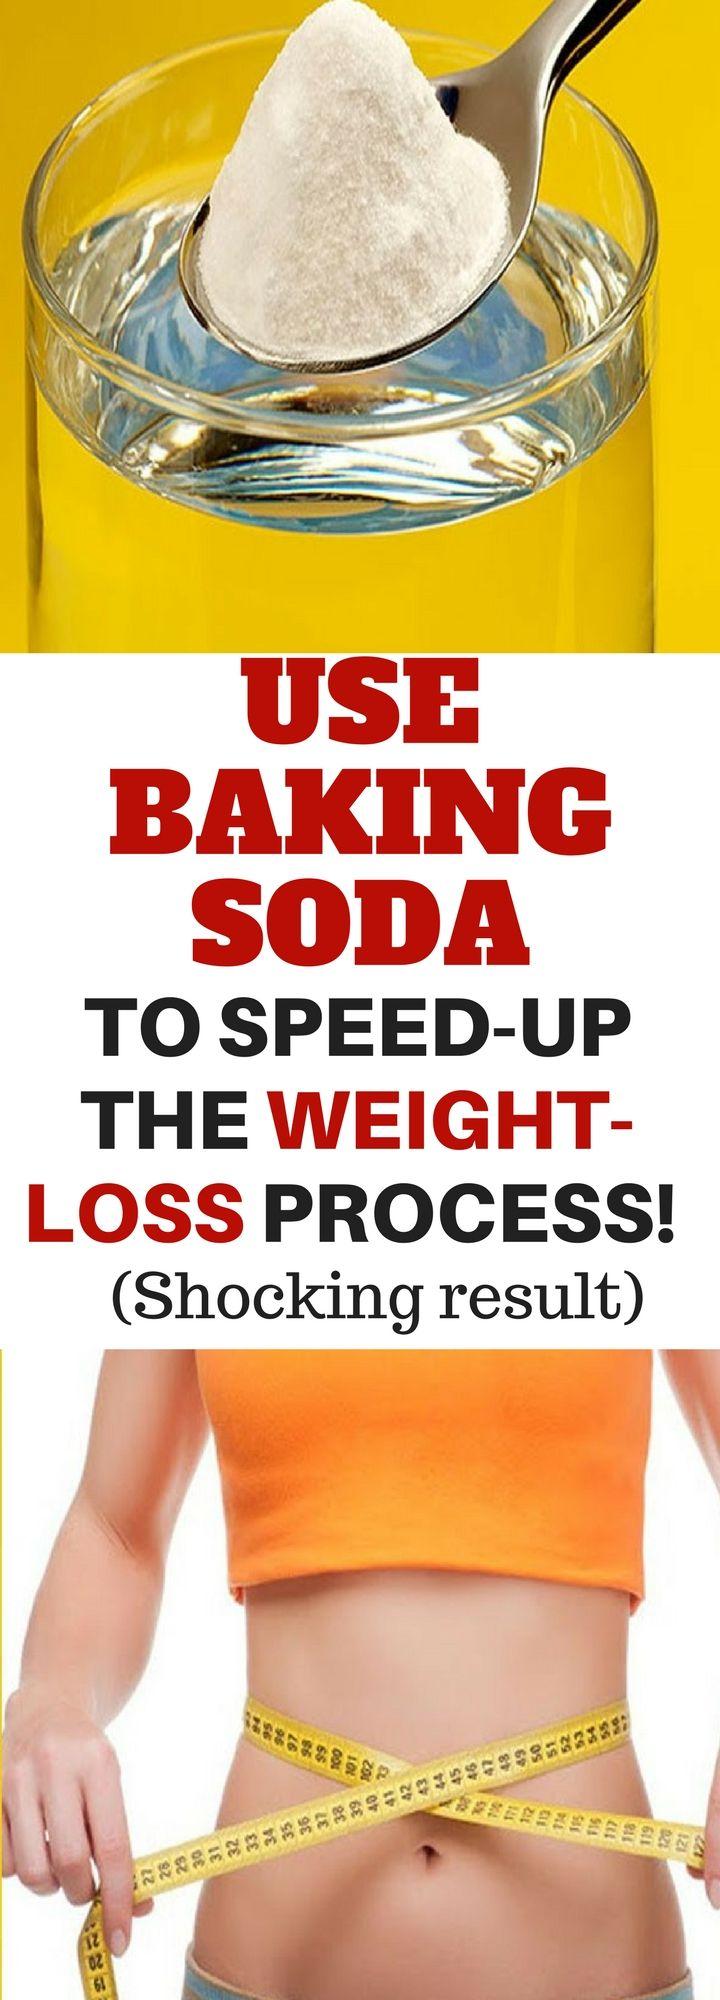 Lose weight on green smoothie diet